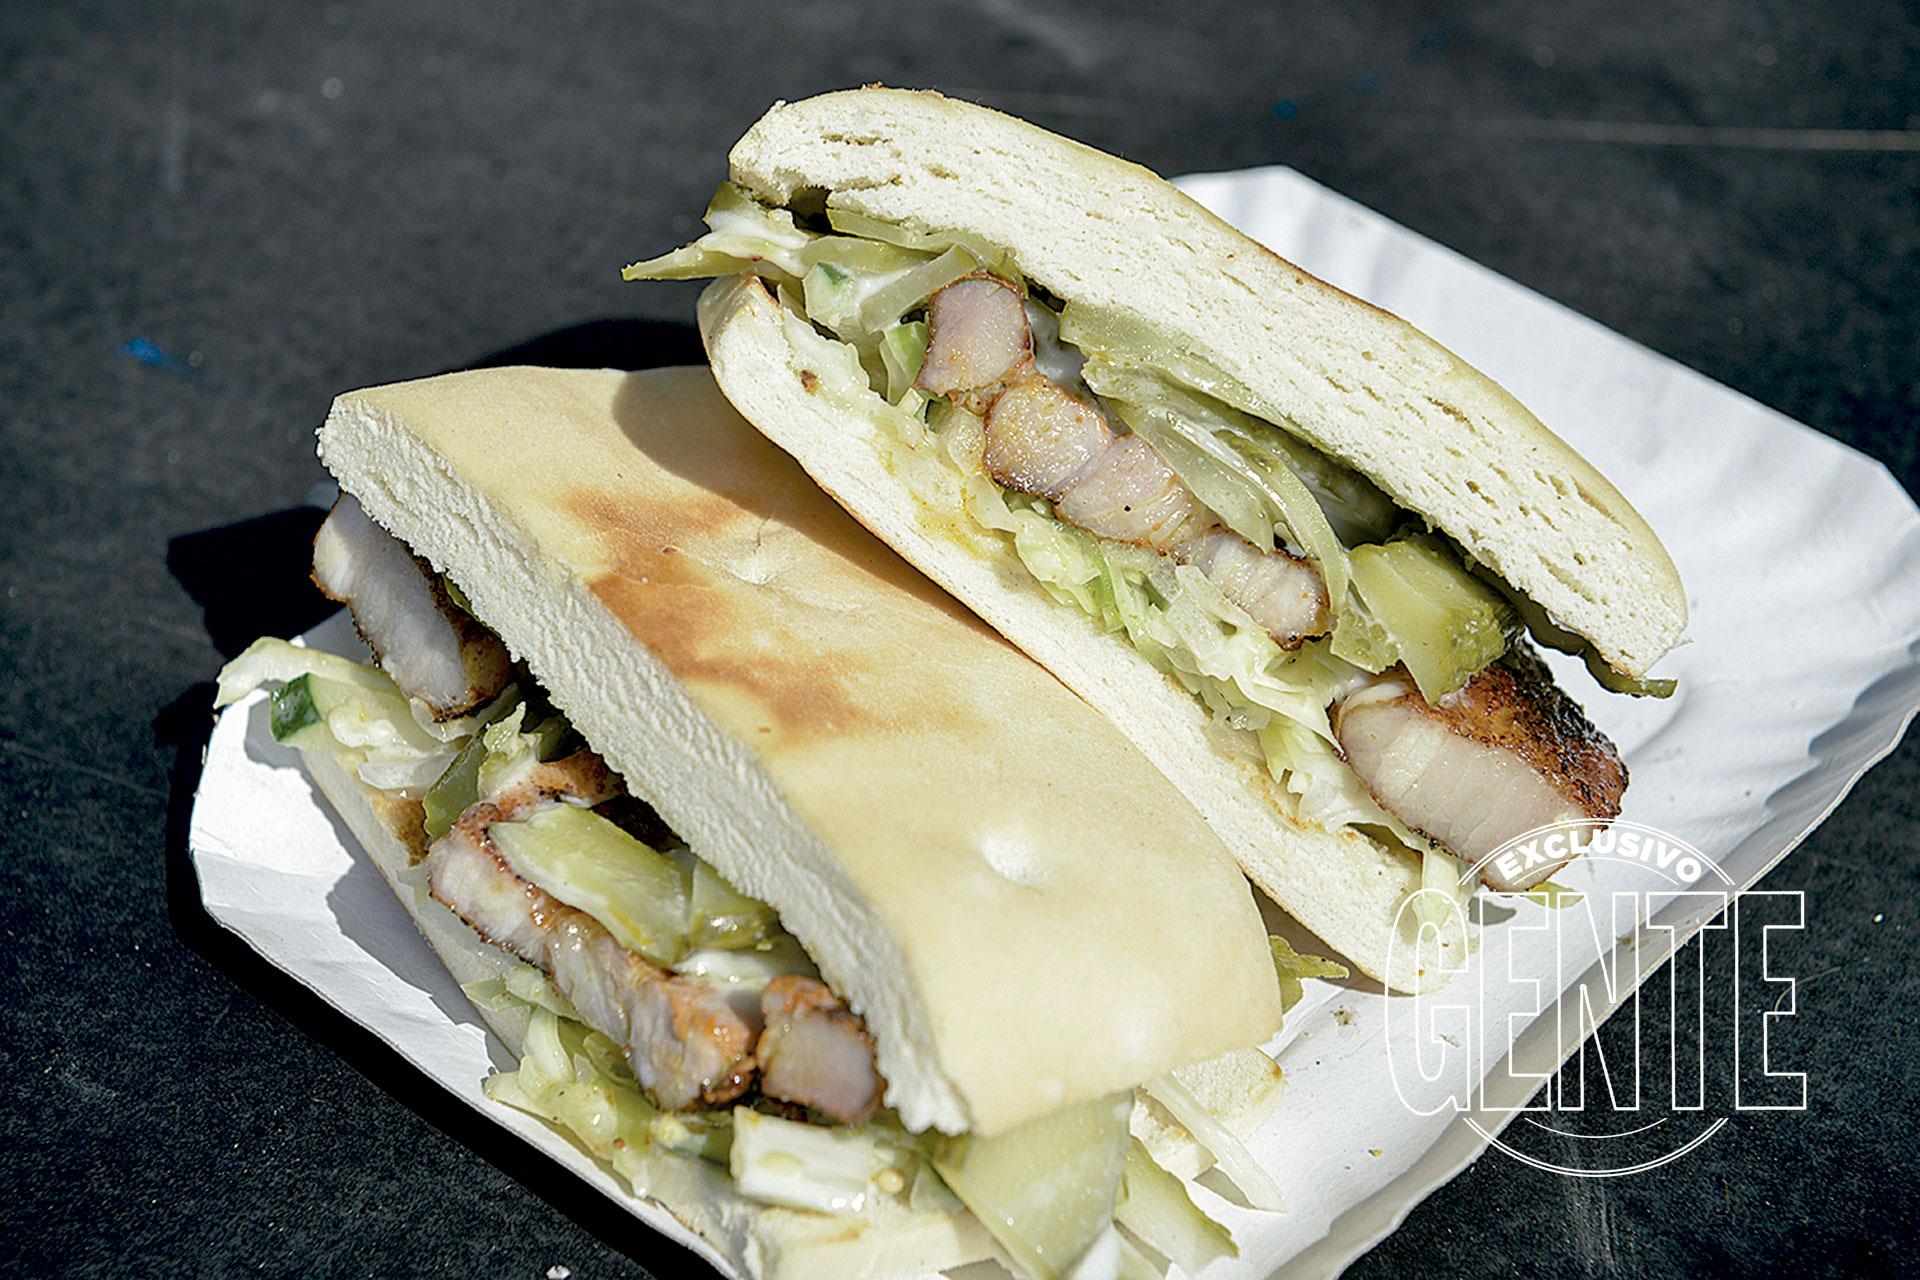 Café San Juan. Sándwich de pechito de cerdo a la parrilla adobado con especias árabes.